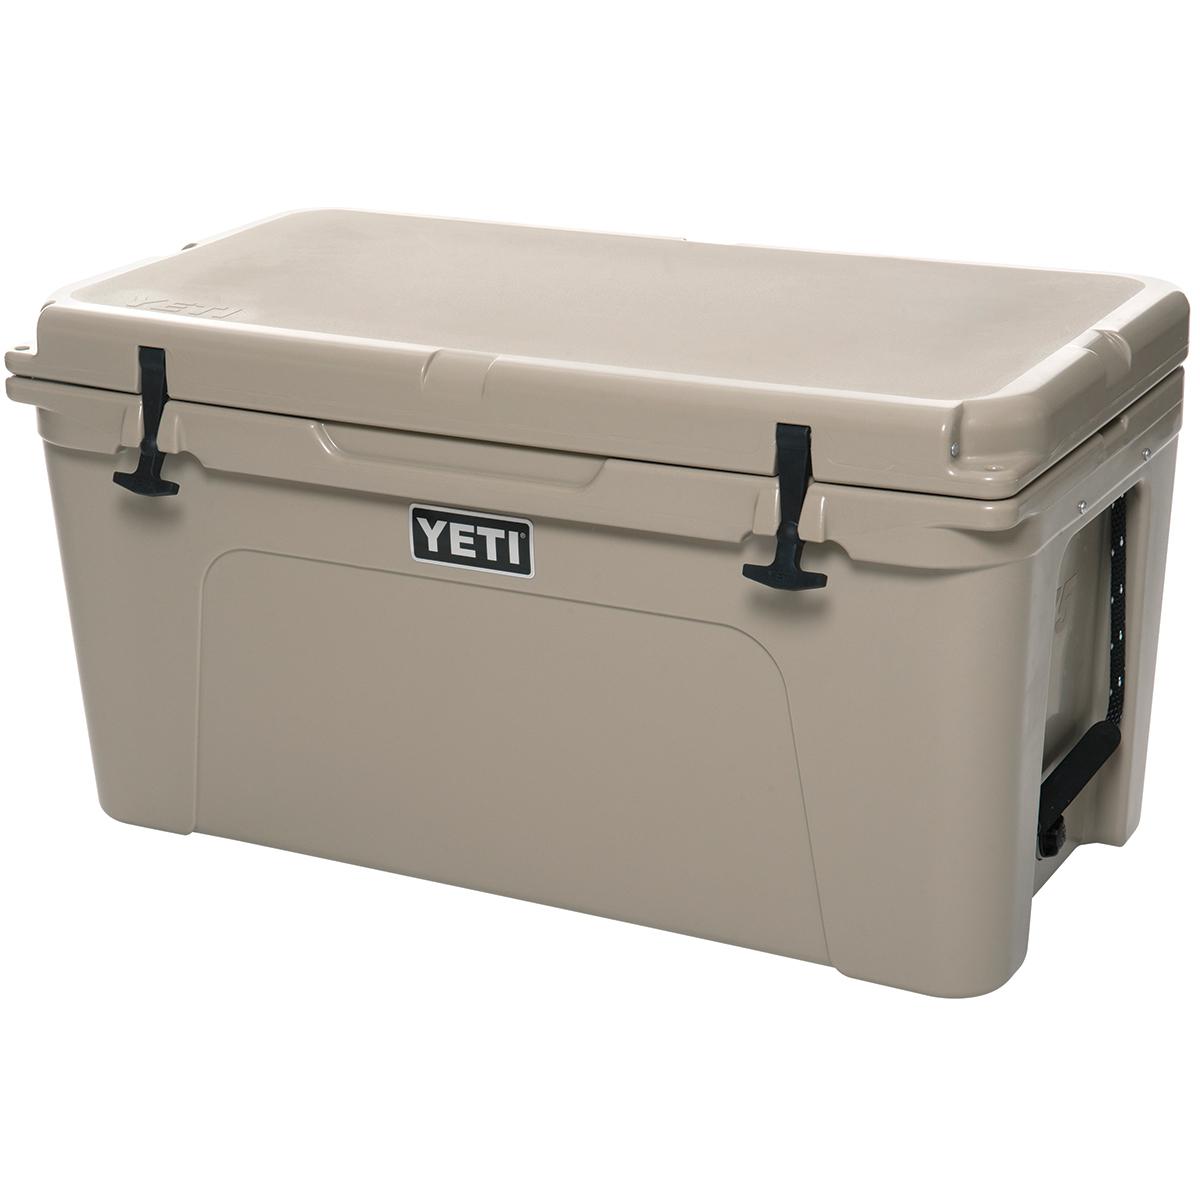 Yeti Tundra 75 Hard Cooler